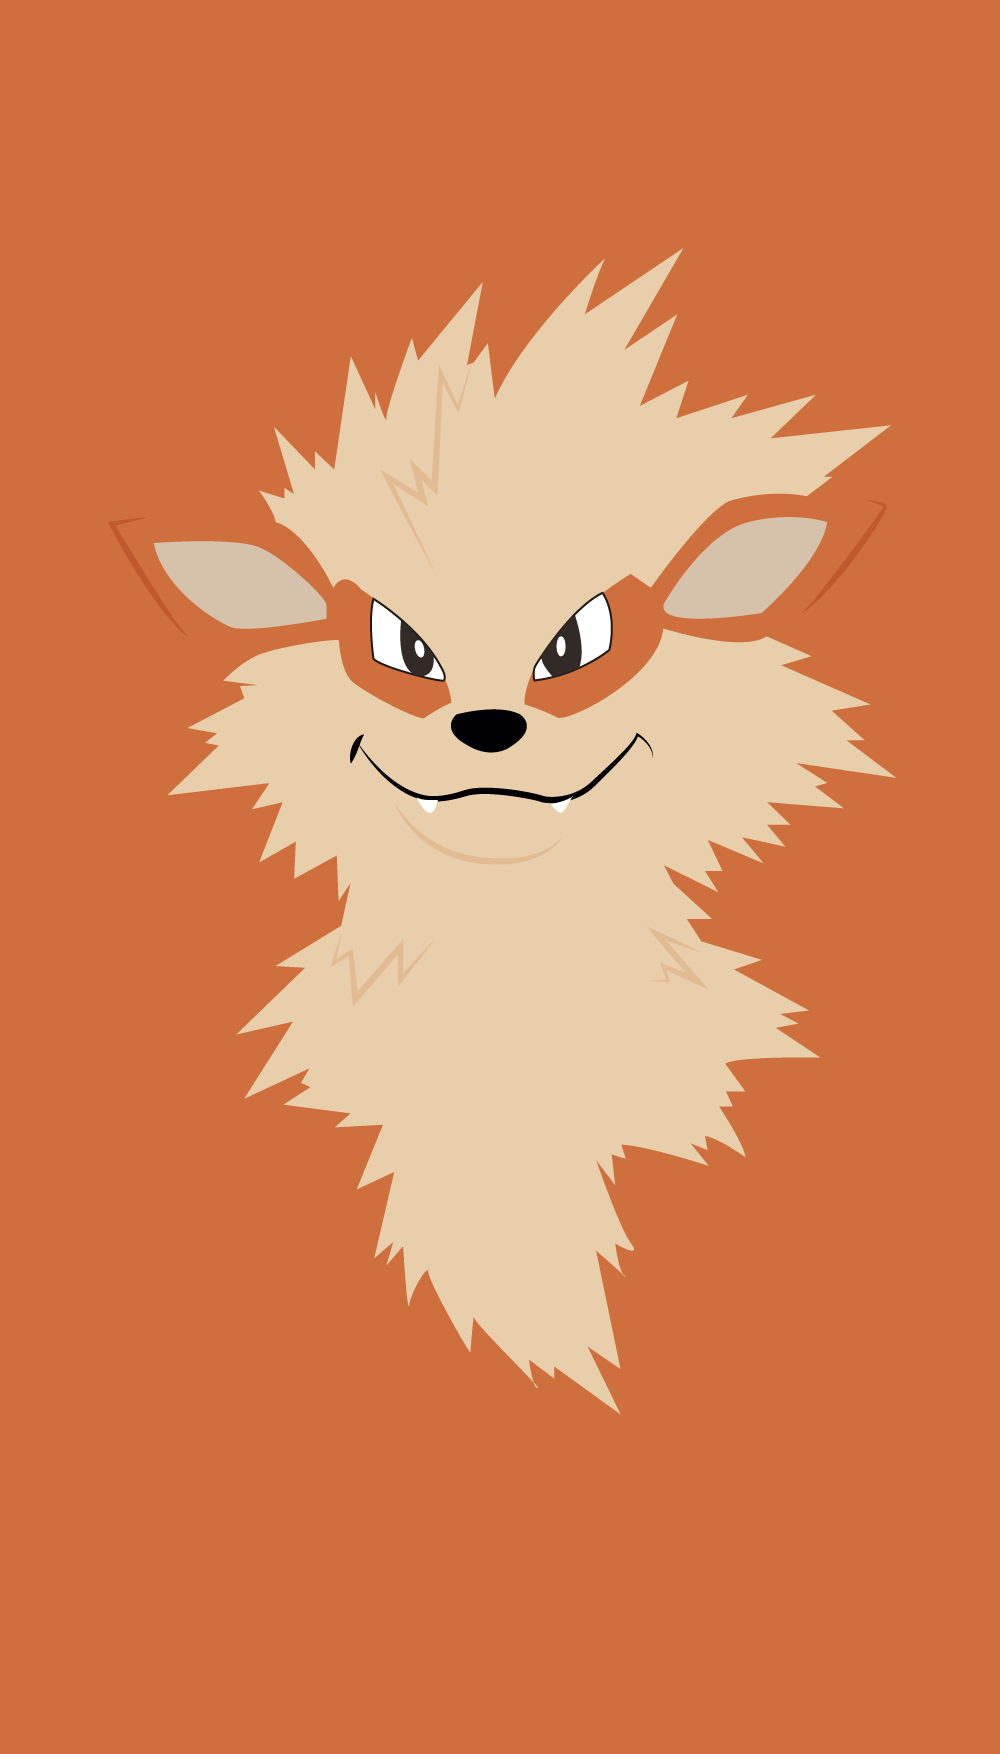 Pokemon Wallpaper Arcanine | Wallpapers | Pinterest | Pokémon …